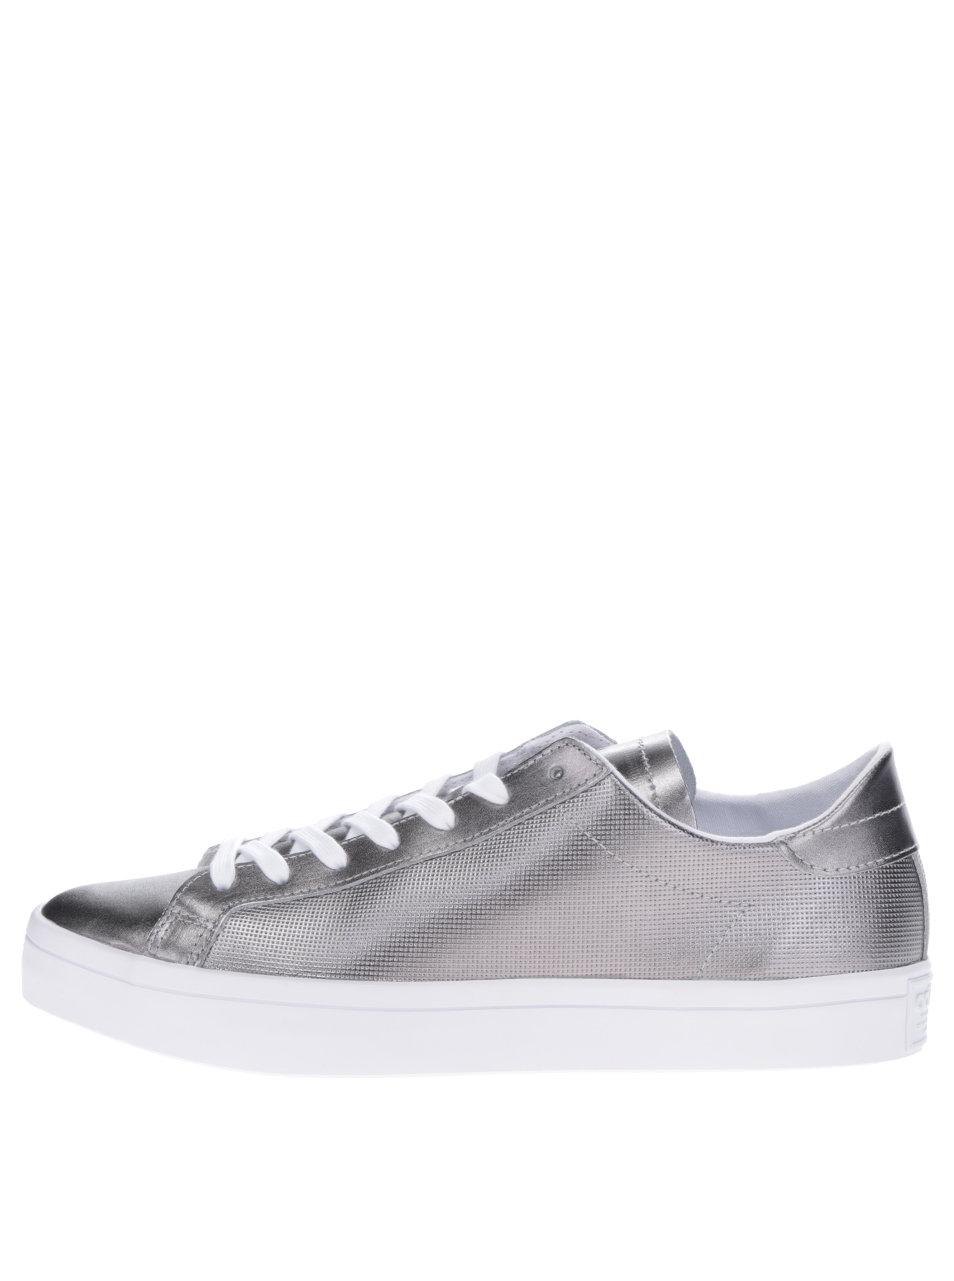 Dámské kožené tenisky ve stříbrné barvě adidas Originals Courtvantage ... 5dd31e22ad